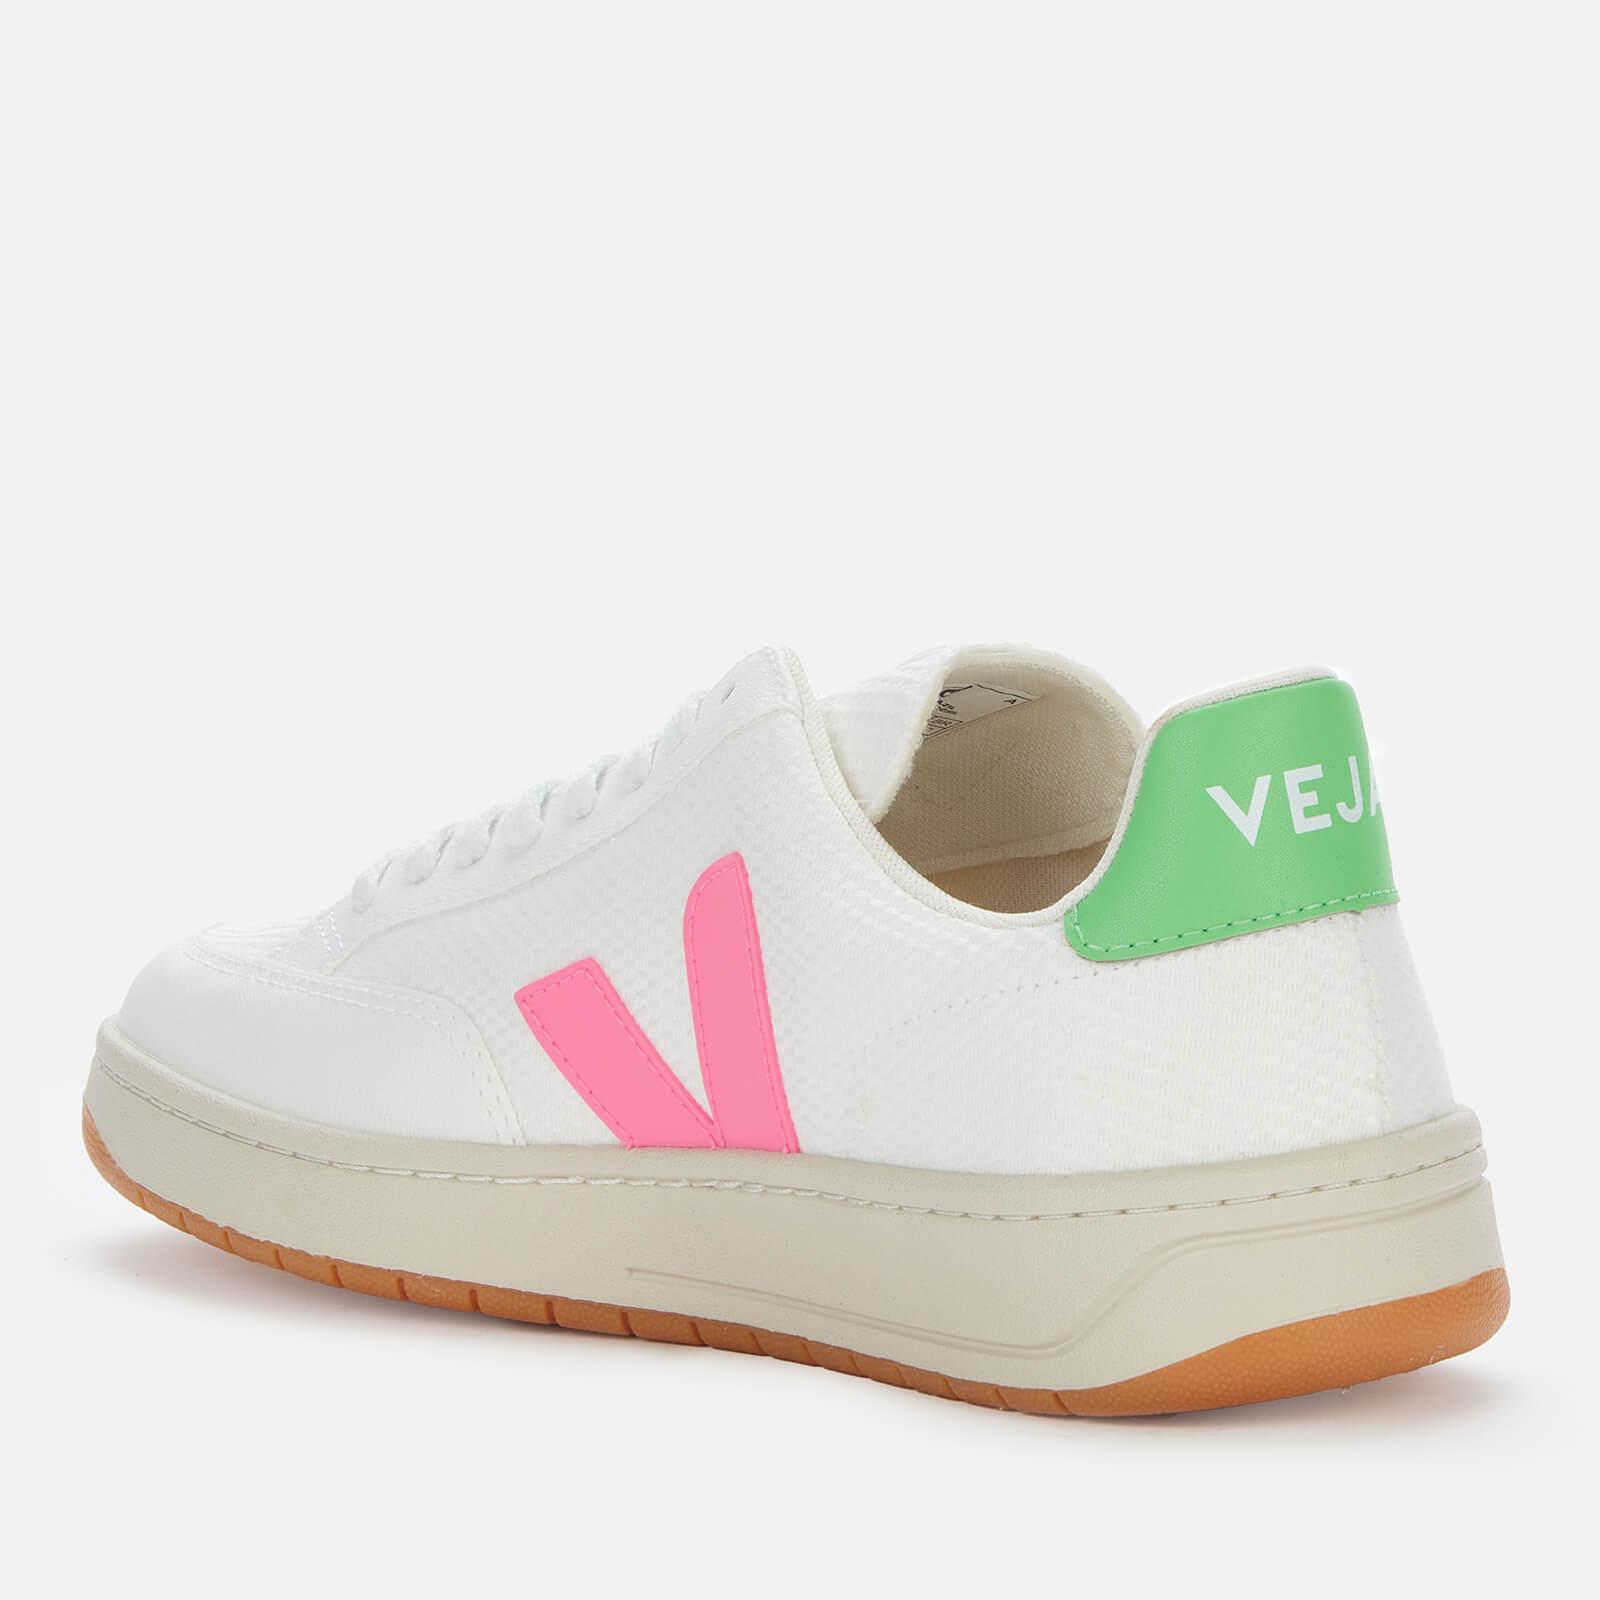 Veja Women's V-12 B-Mesh Trainers - White/Sari/Absinthe